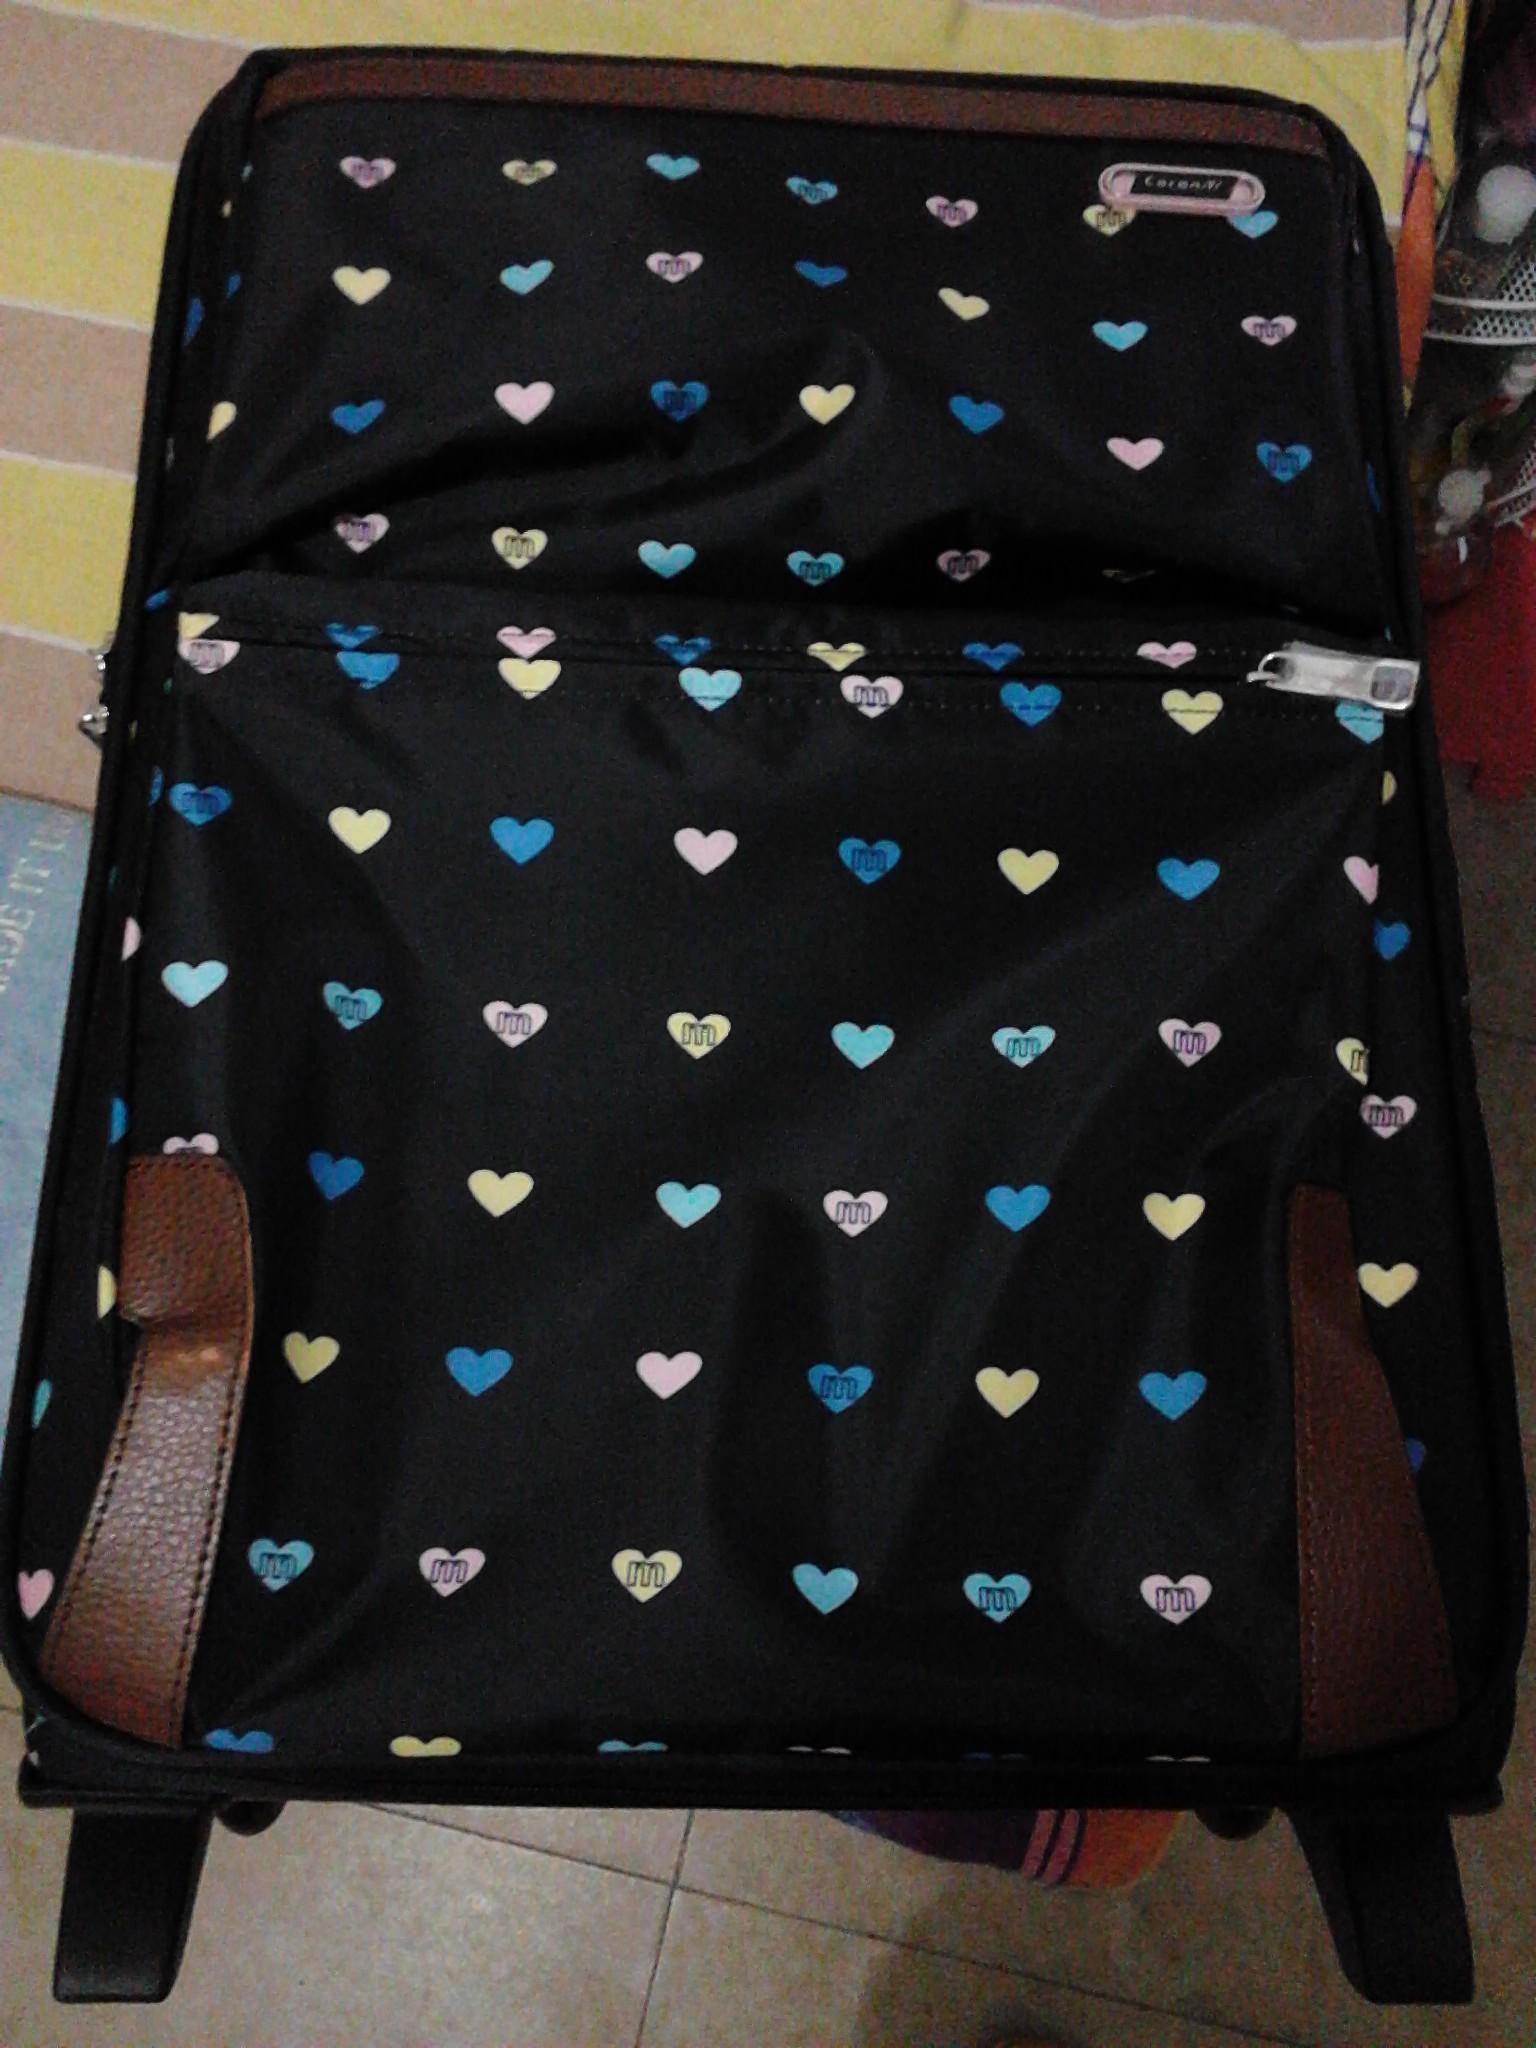 bon jovi t shirts 00289653 women